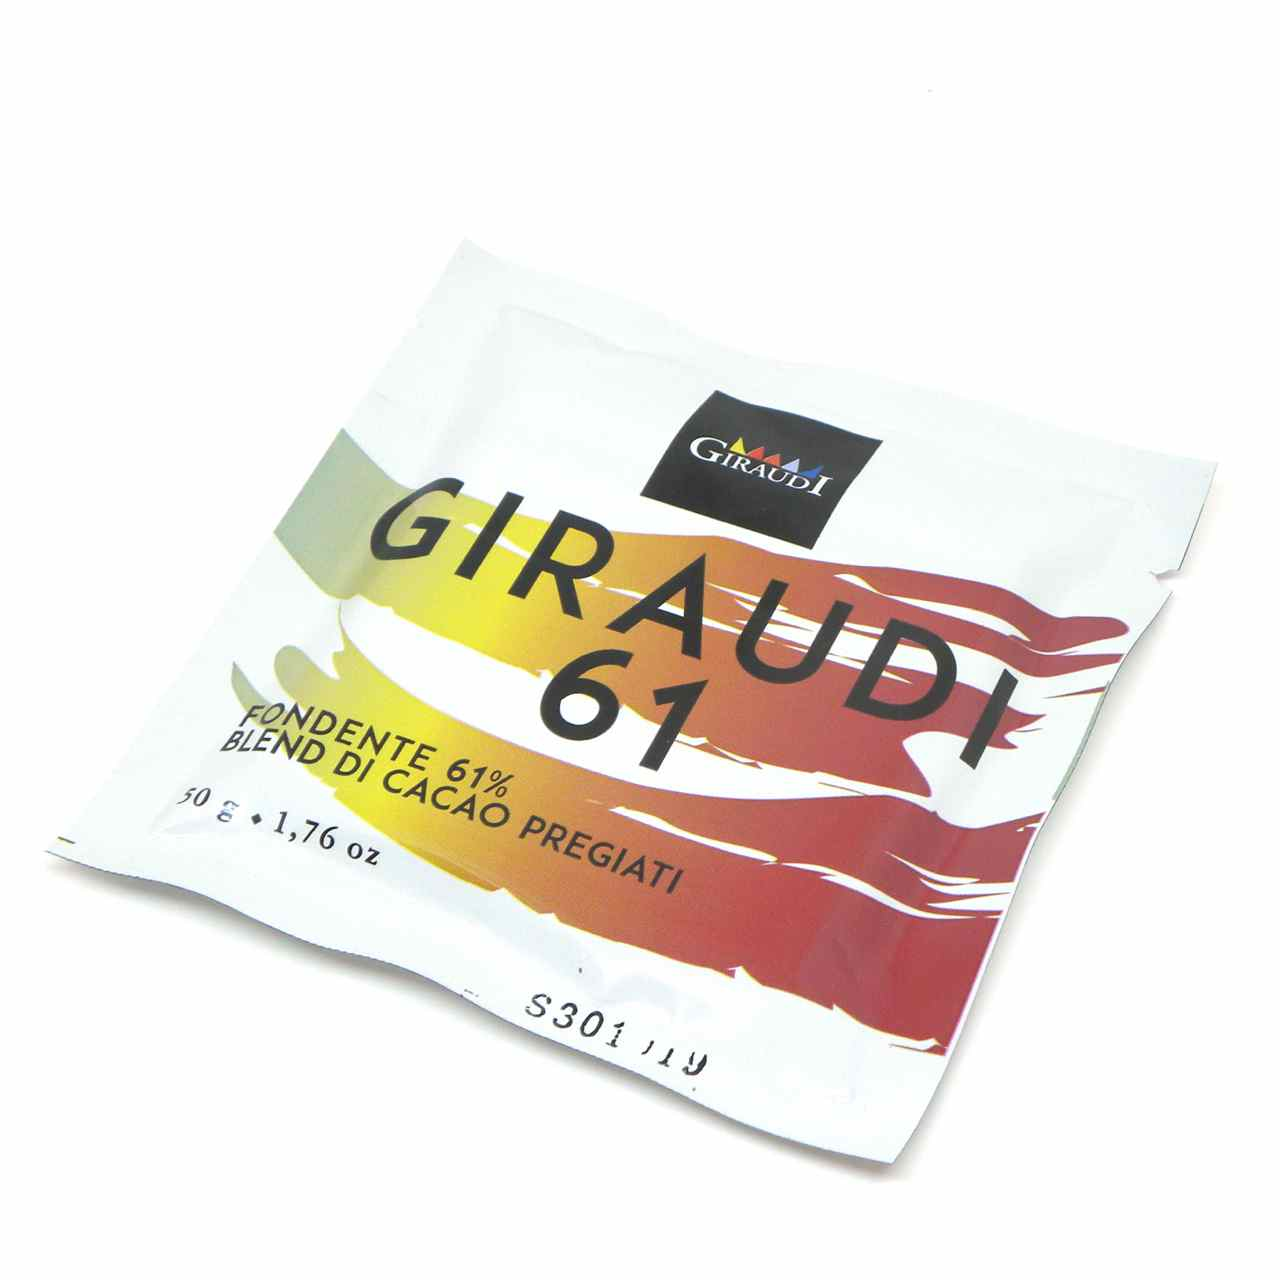 Giraudi tavoletta cioccolato fondente 61 – Giraudi dark chocolate bar 61 – Gustorotondo – Italian food boutique